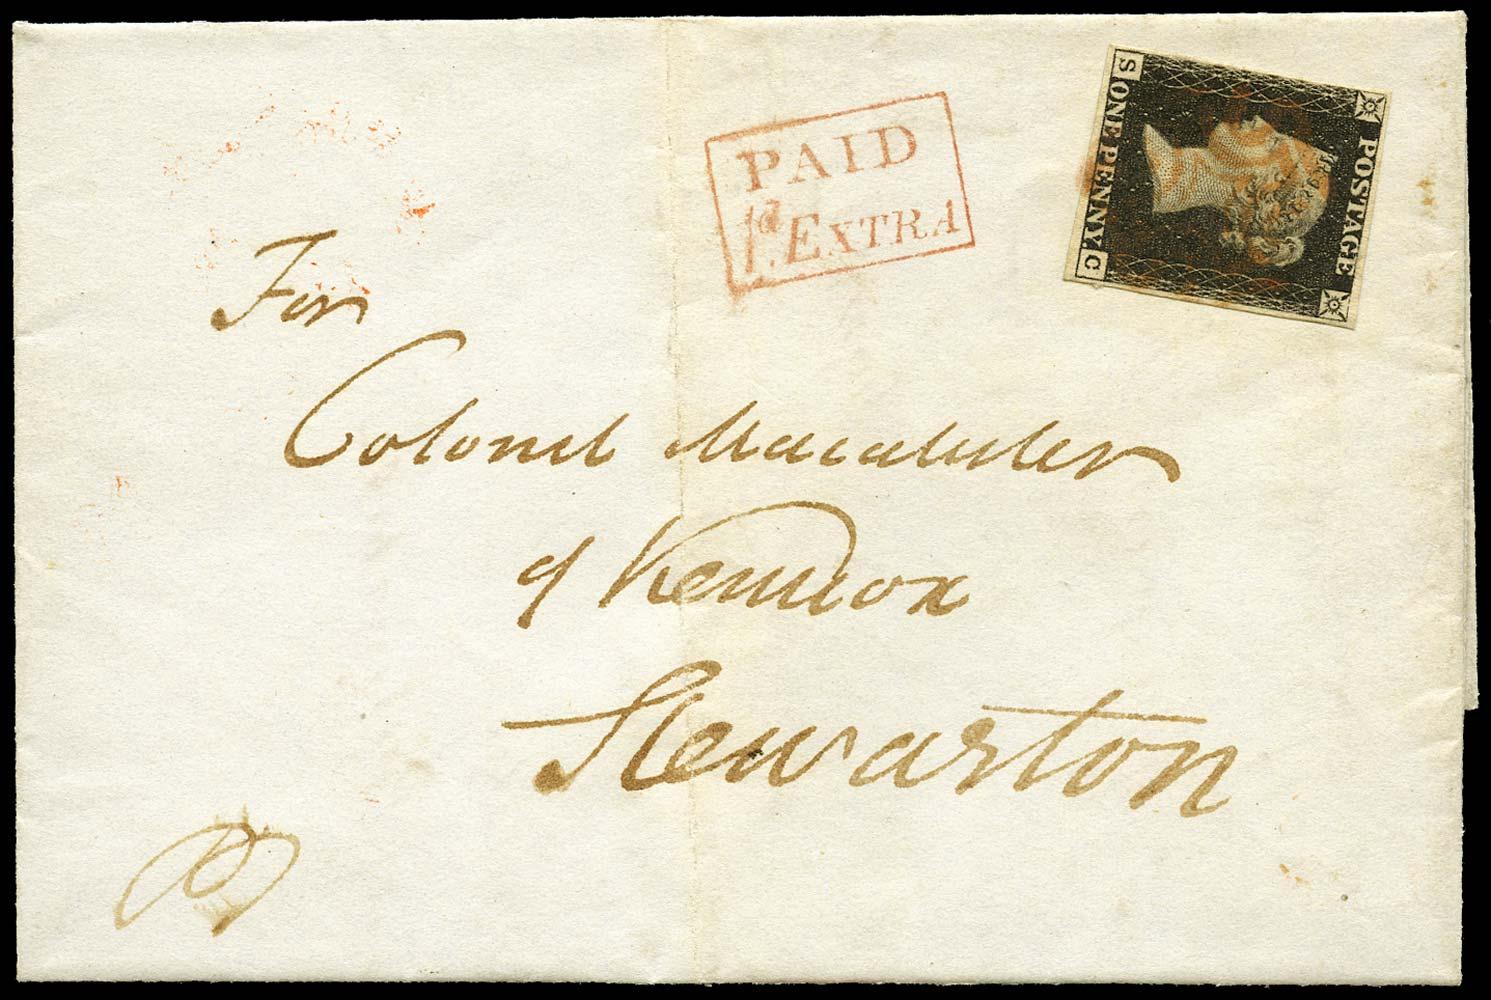 GB 1840  SG2 Pl.7 Penny Black - Late fee cover to Stewarton